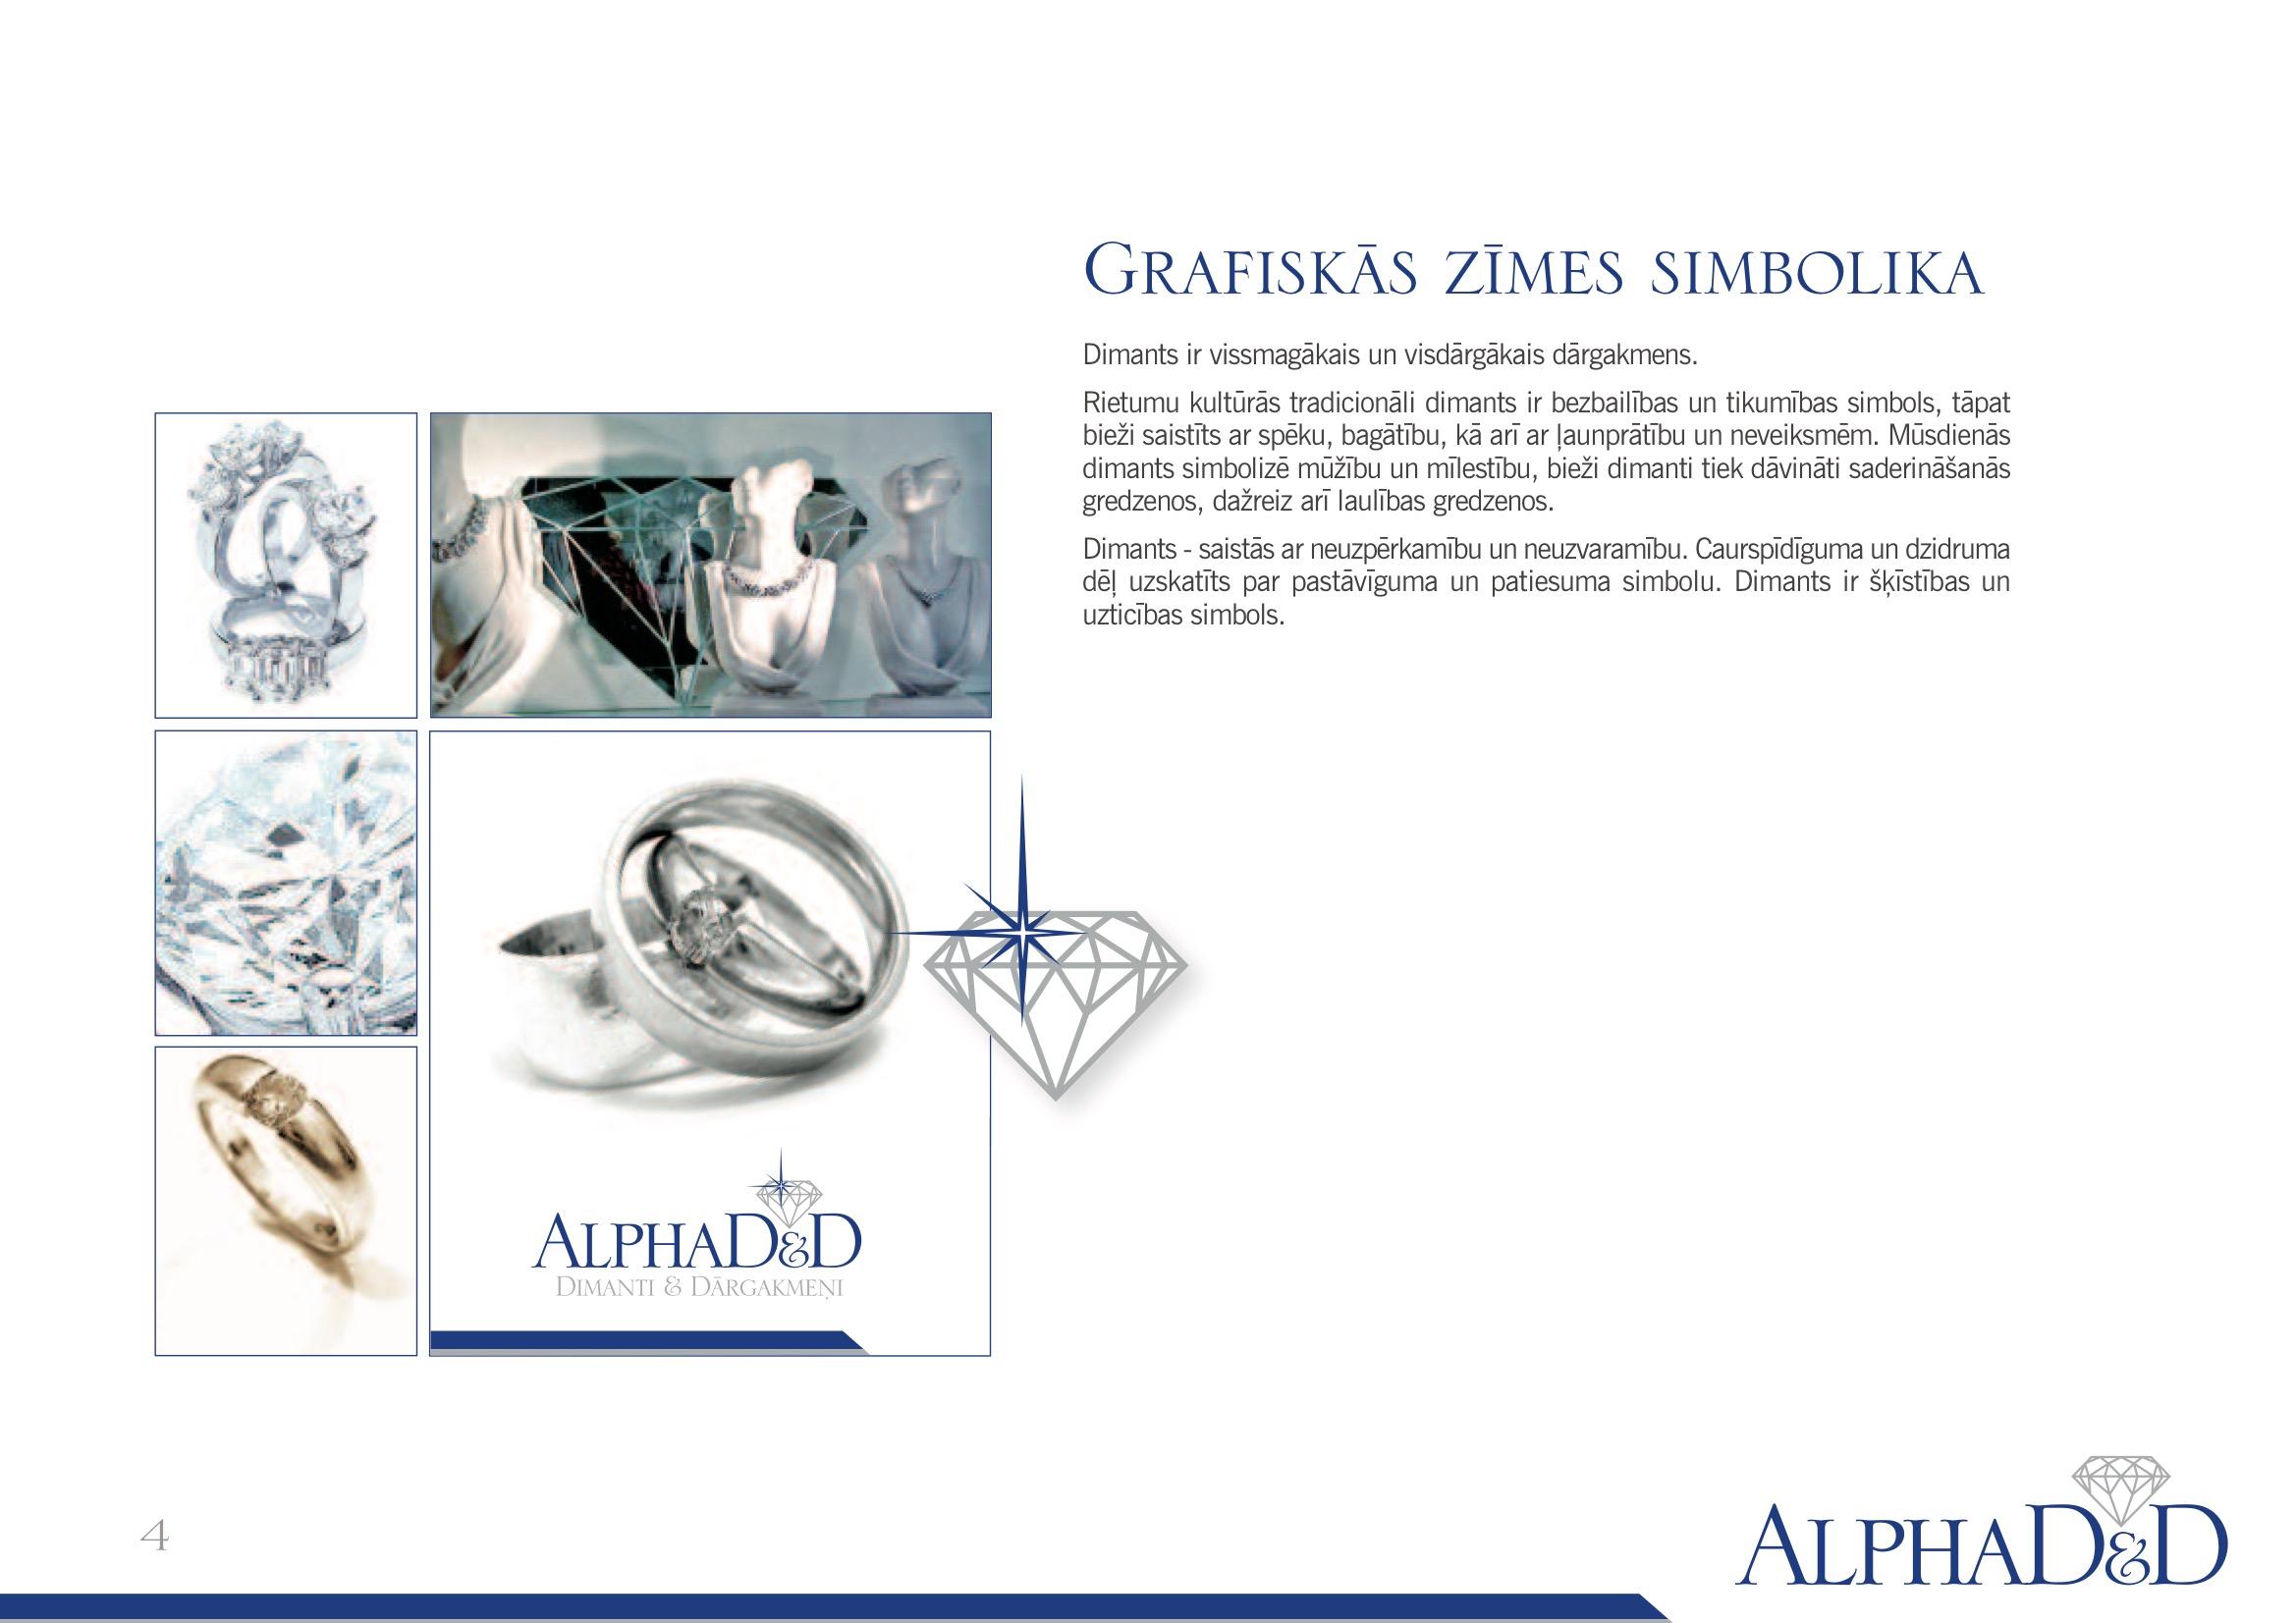 AlphaDD_Stils 4